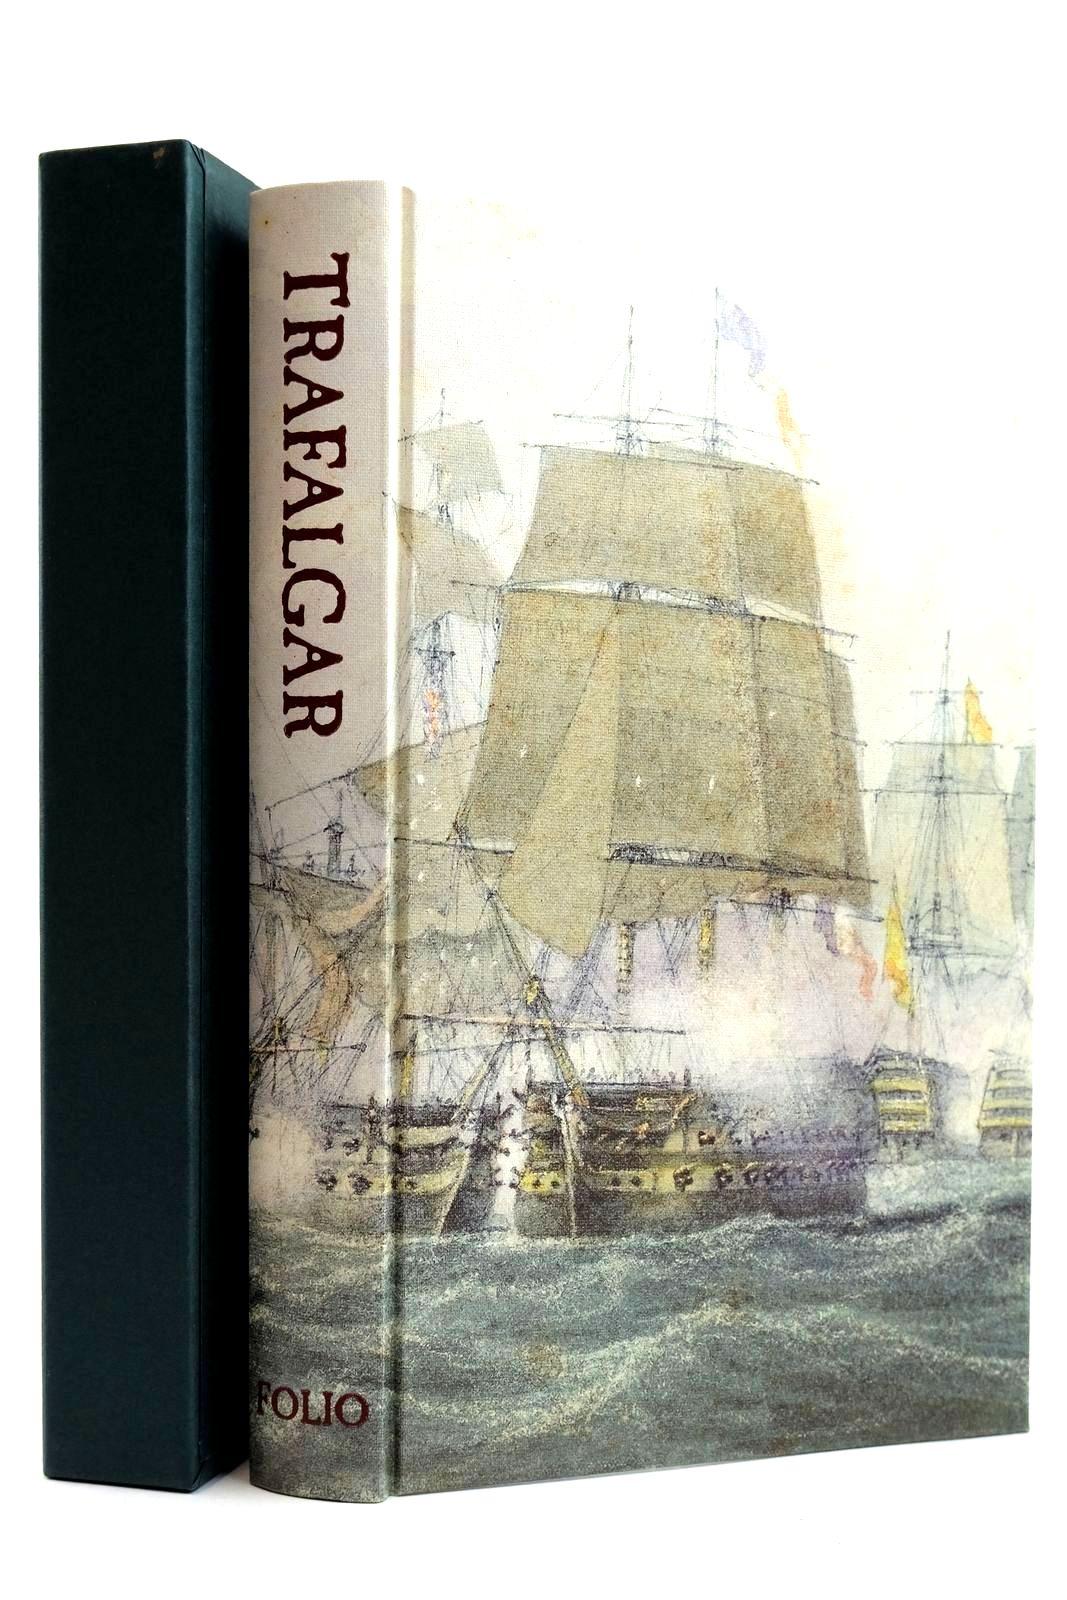 Photo of TRAFALGAR AN EYEWITNESS HISTORY written by Pocock, Tom illustrated by Piggott, Reginarld<br />Turner, J.M.W. published by Folio Society (STOCK CODE: 2132043)  for sale by Stella & Rose's Books